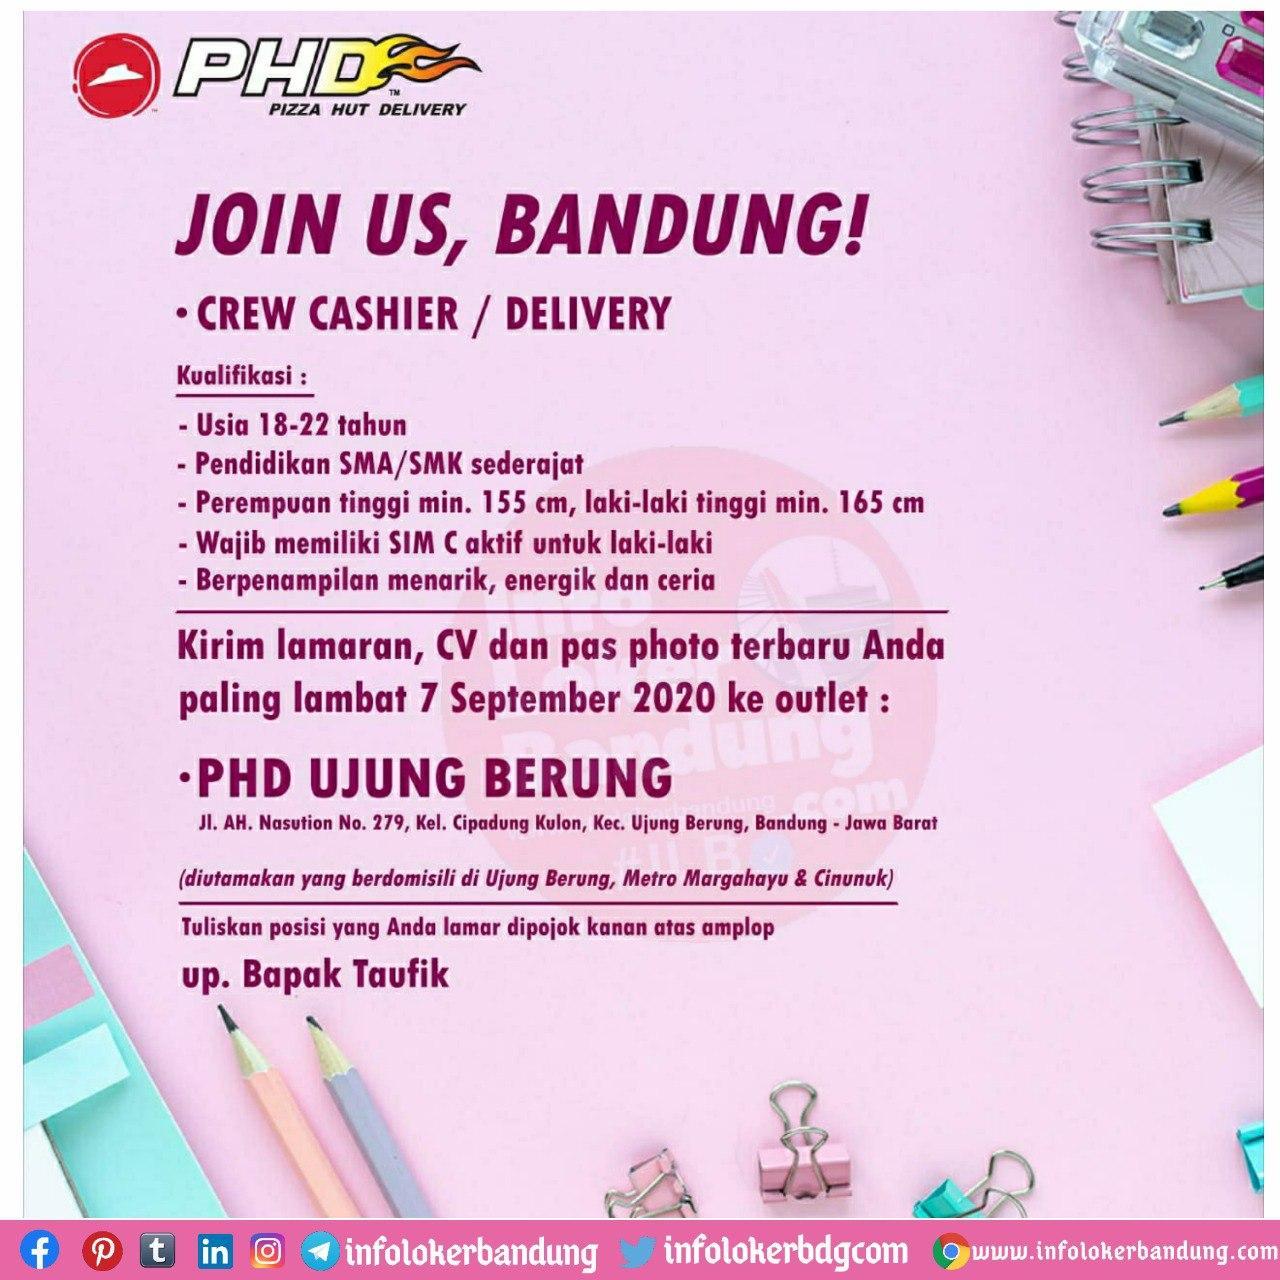 Lowongan Kerja Pizza Hut Delivery ( PHD ) Ujung Berung Bandung September 2020